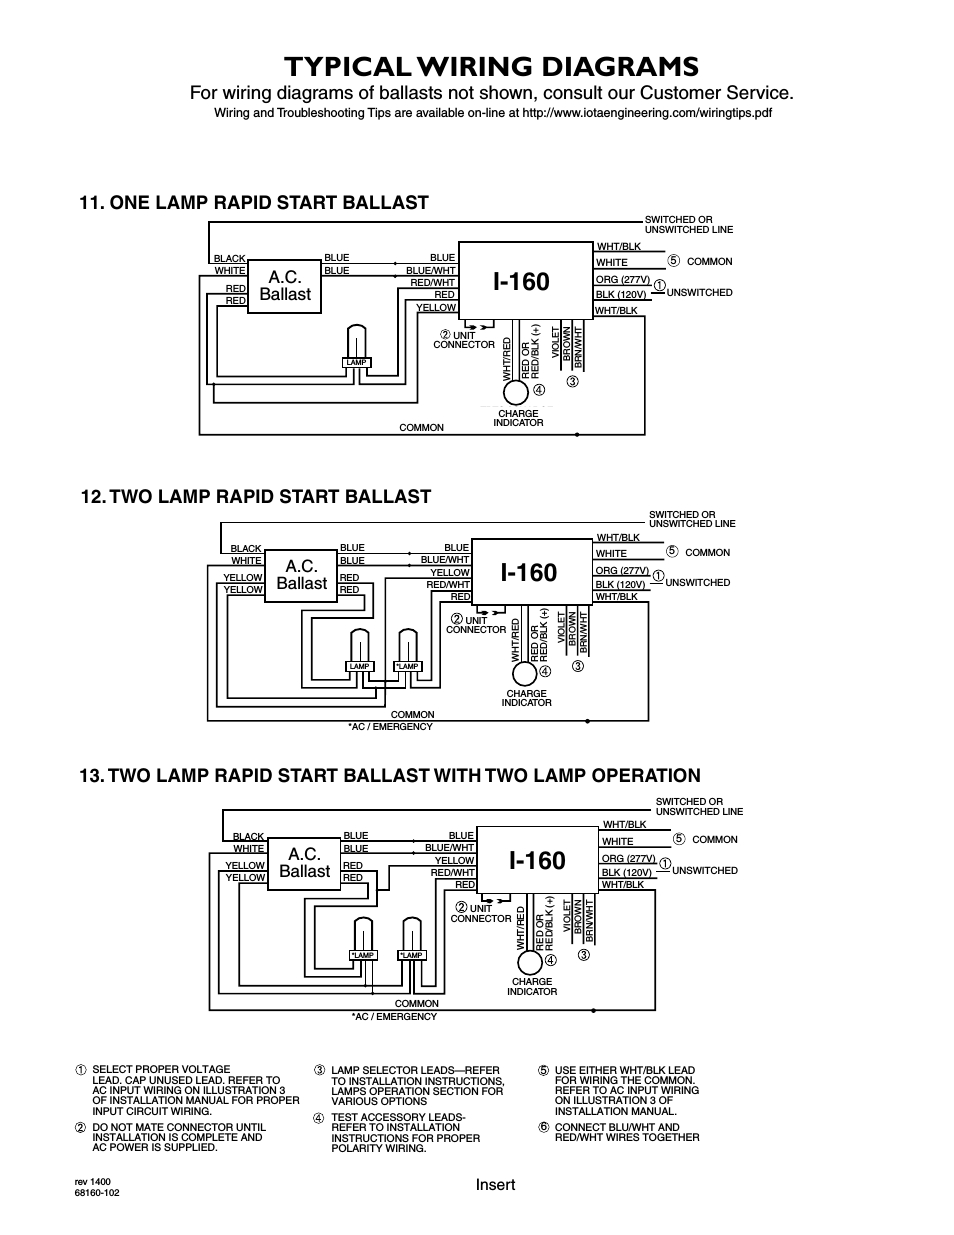 Typical Wiring Diagrams, I-160, A.c. Ballast | Iota I-160 User - Ballast Wiring Diagram